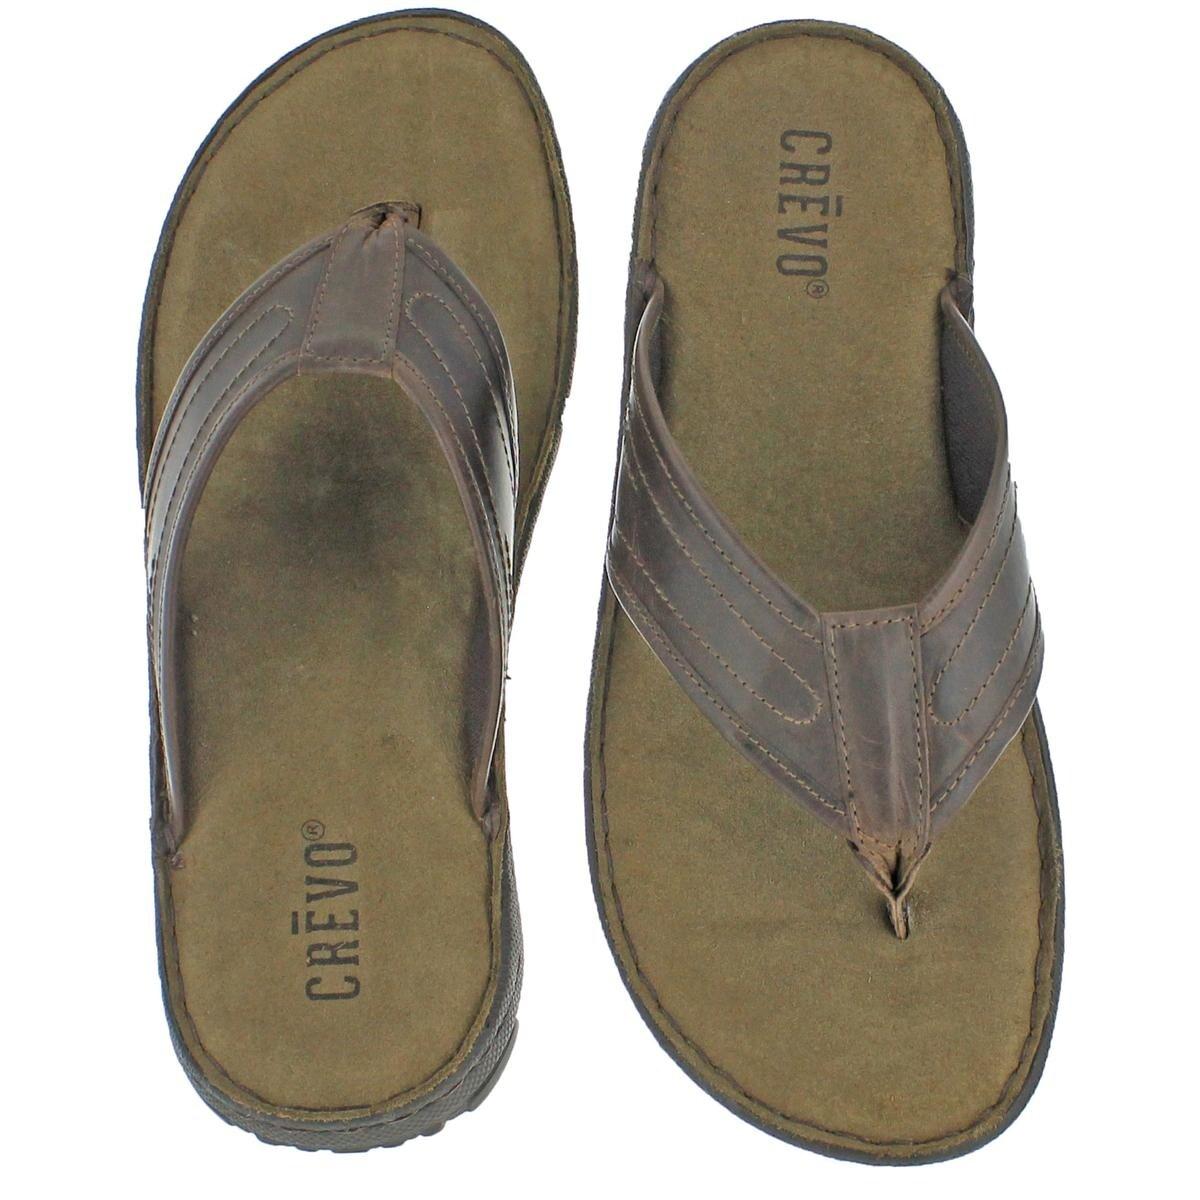 046dfc5b8298 Shop Crevo Mens Matteo Flip-Flops Leather Memory Foam - 13 Medium (D) - Free  Shipping On Orders Over  45 - Overstock - 23980800